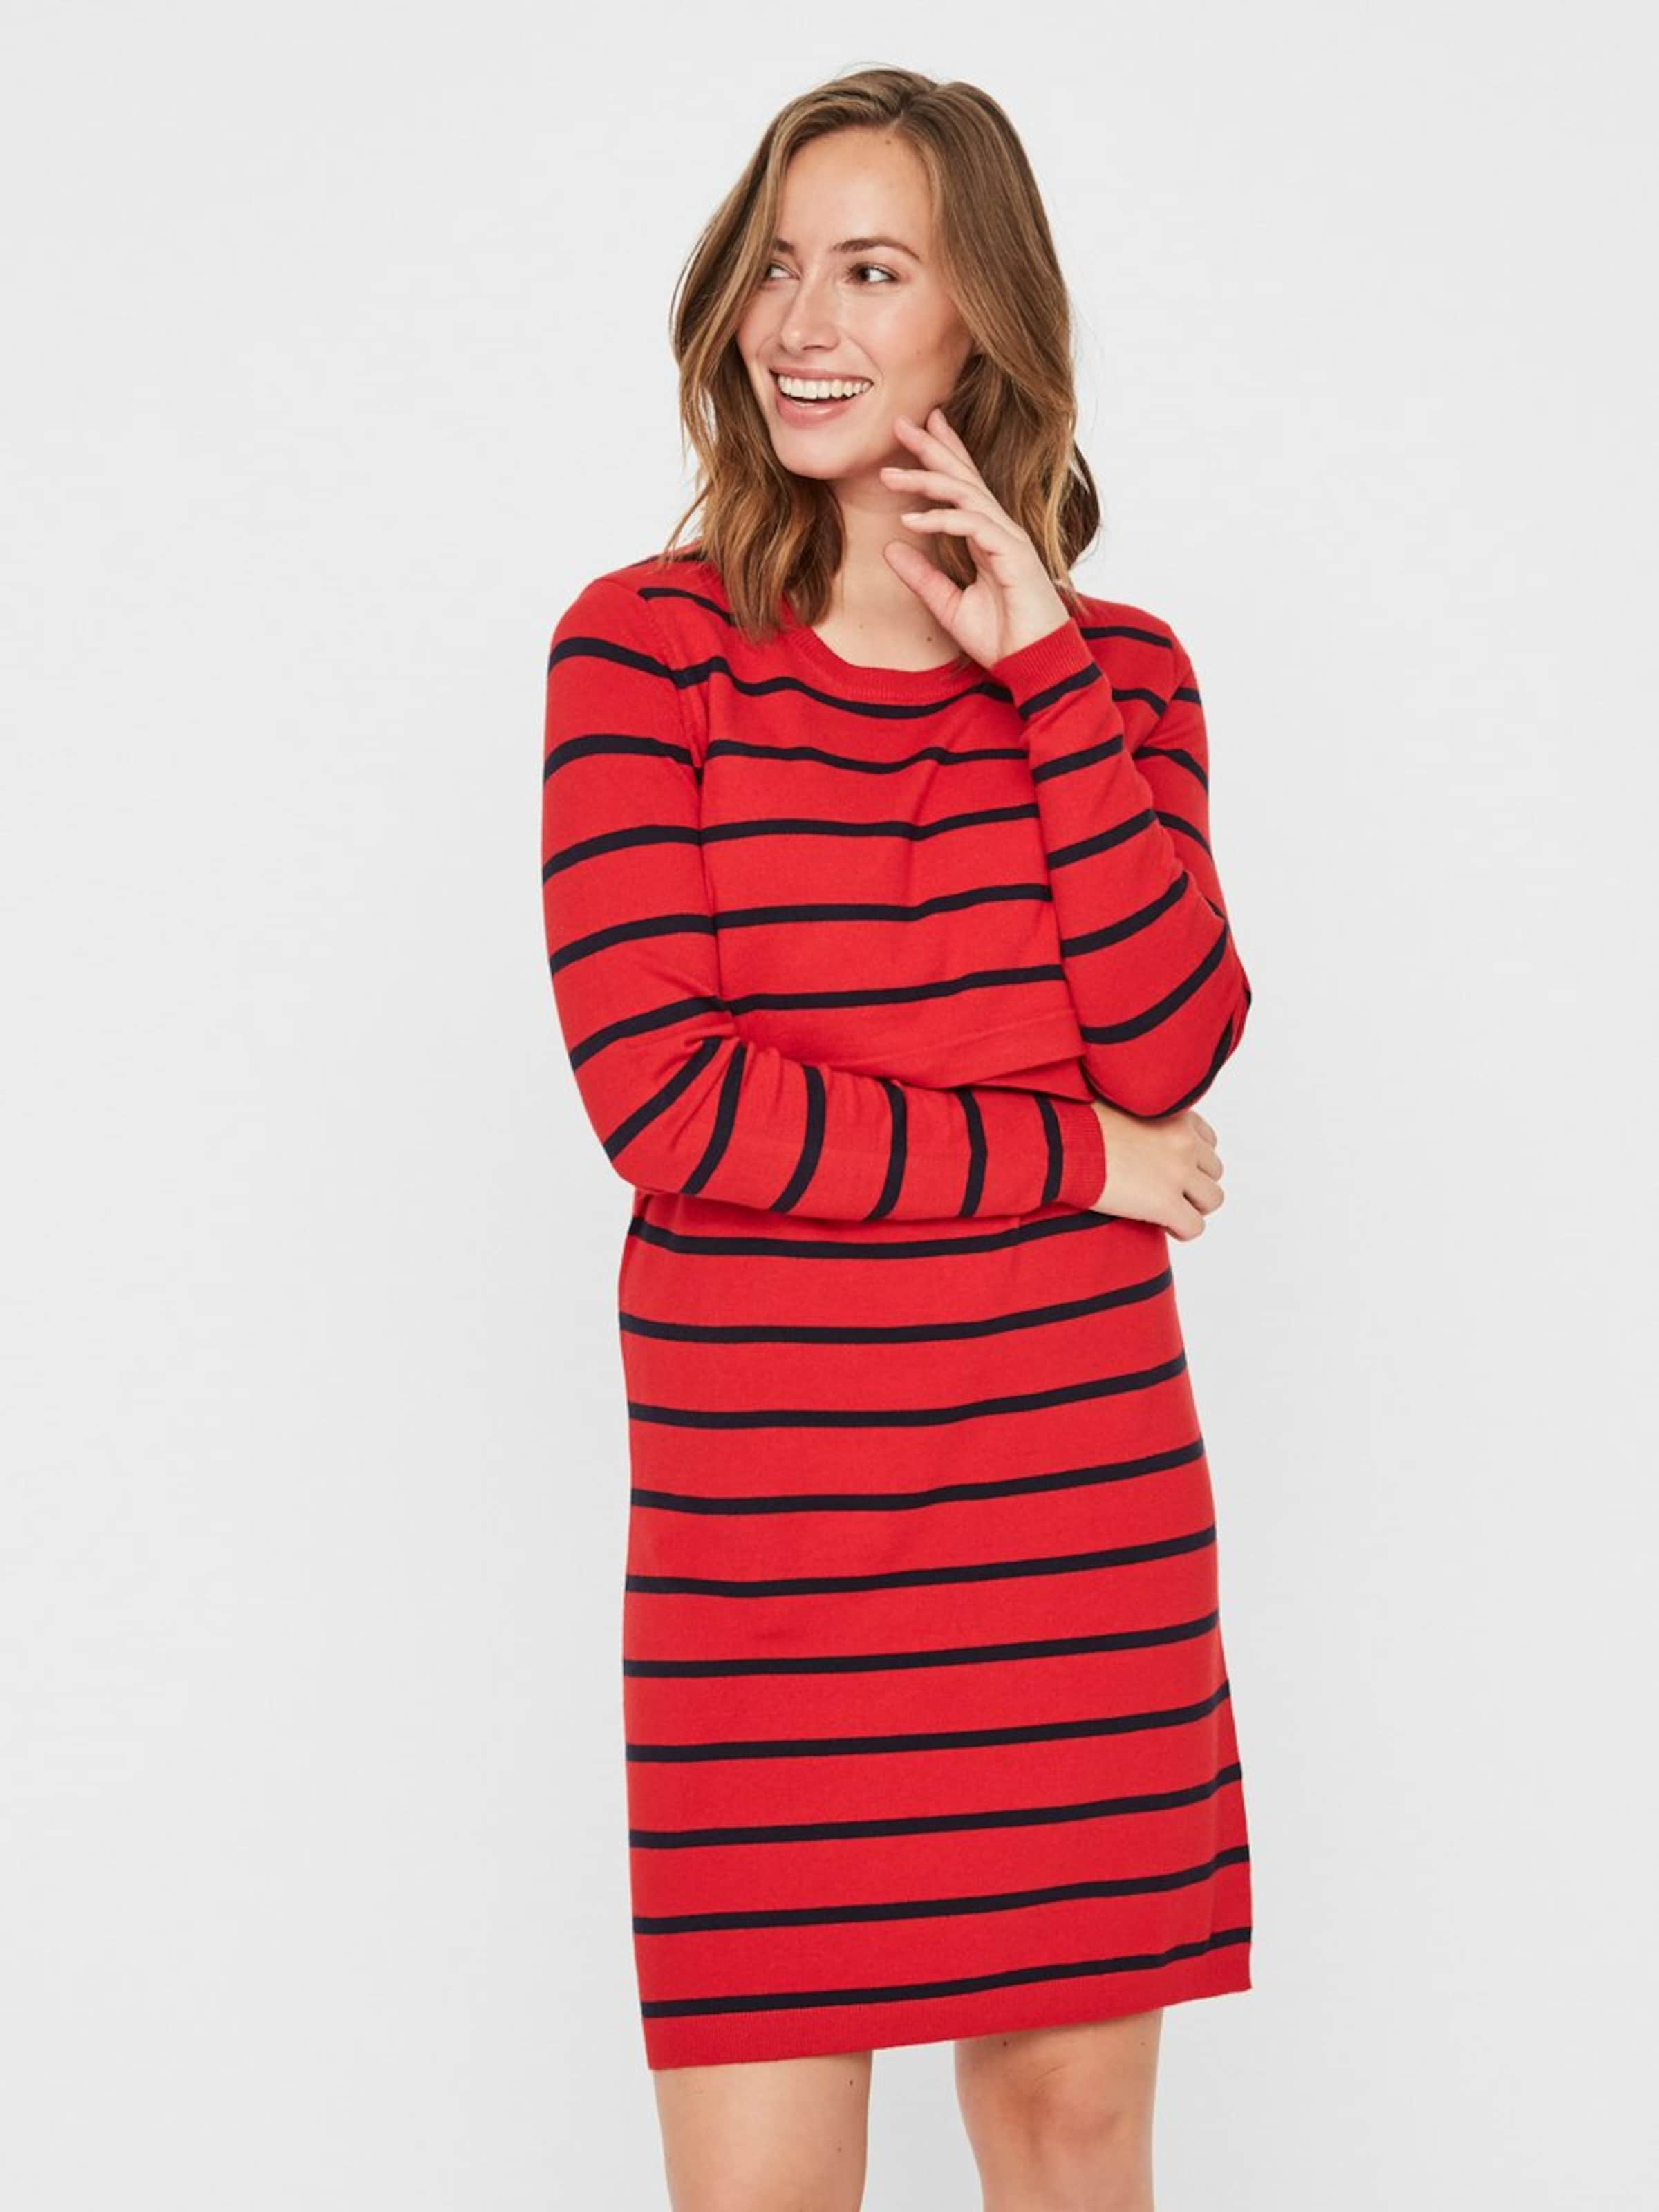 HellrotSchwarz Mamalicious Kleid Kleid Mamalicious In sxCtrdQh